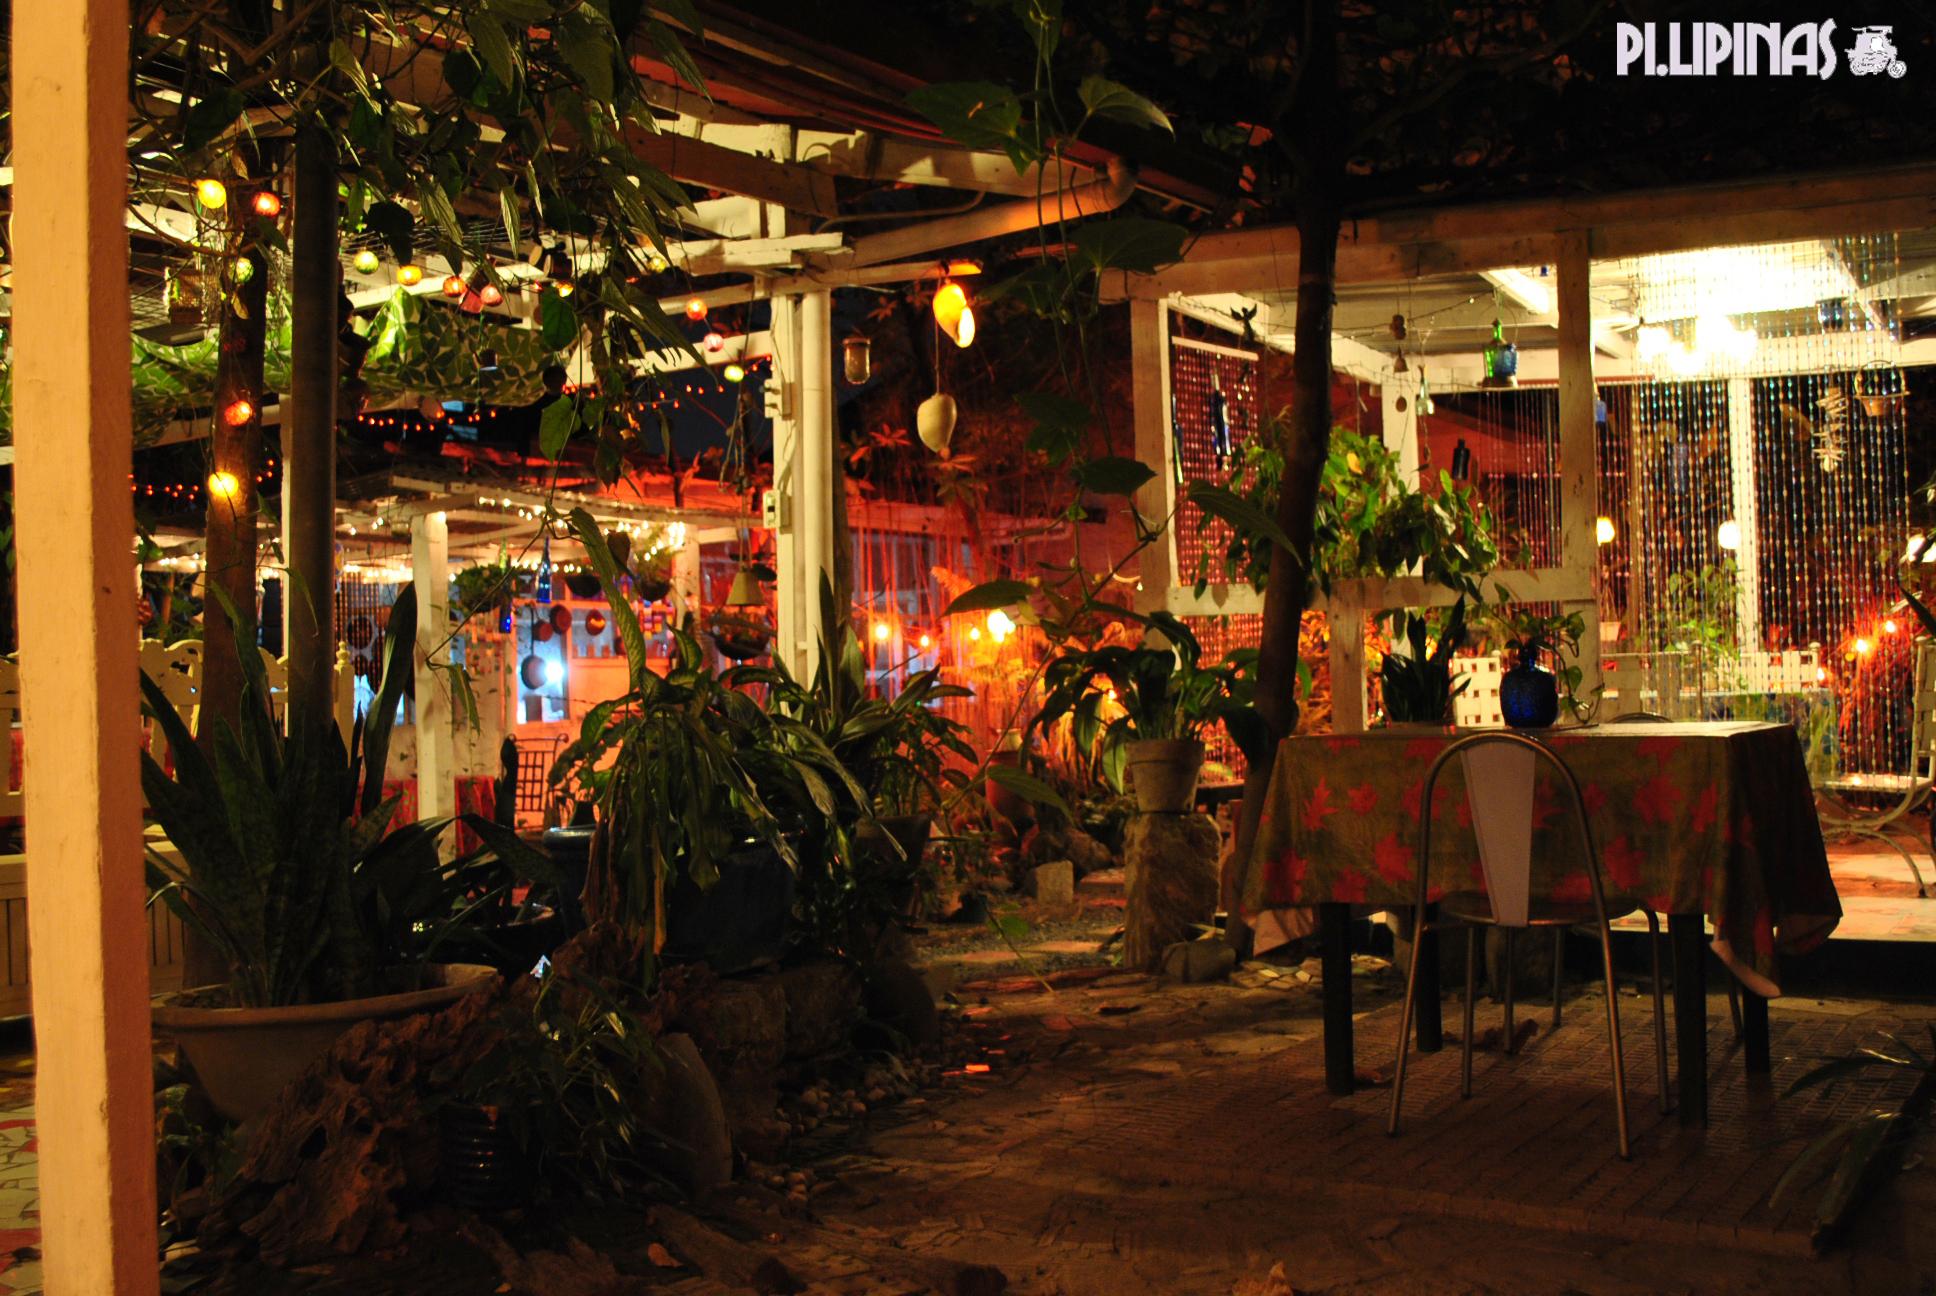 Isabelo-Restaurant-Marikina